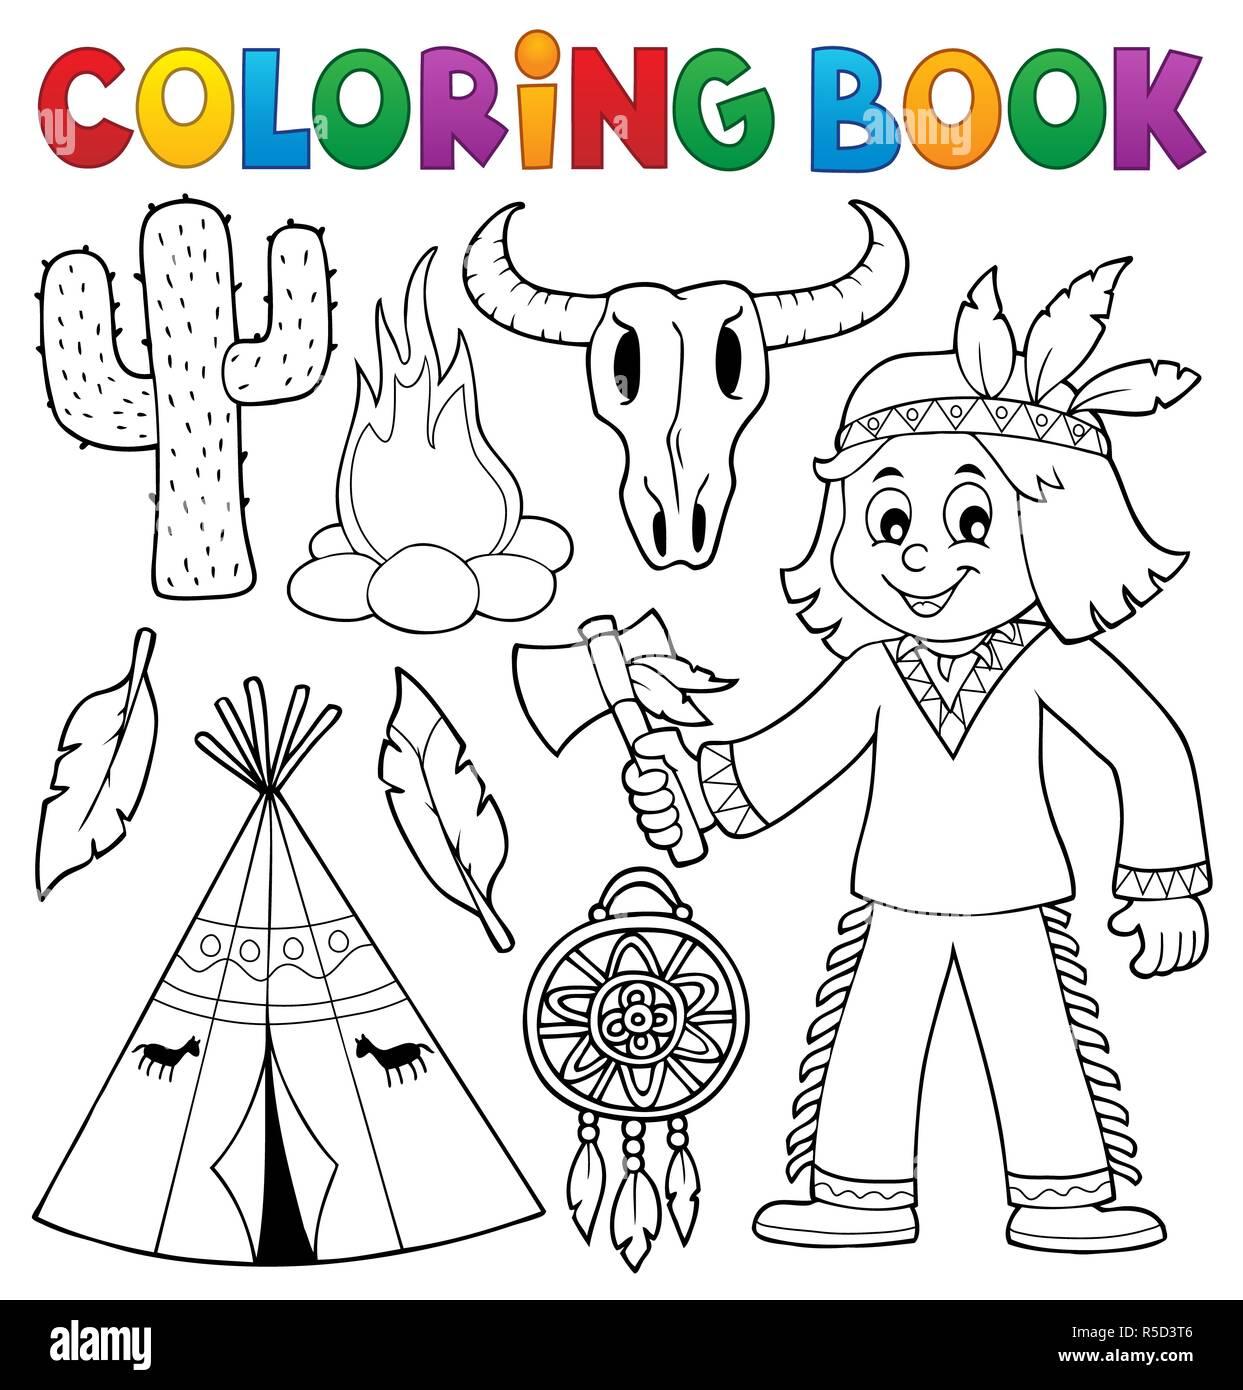 Coloring book Native American theme 2 Stock Photo: 227096470 - Alamy